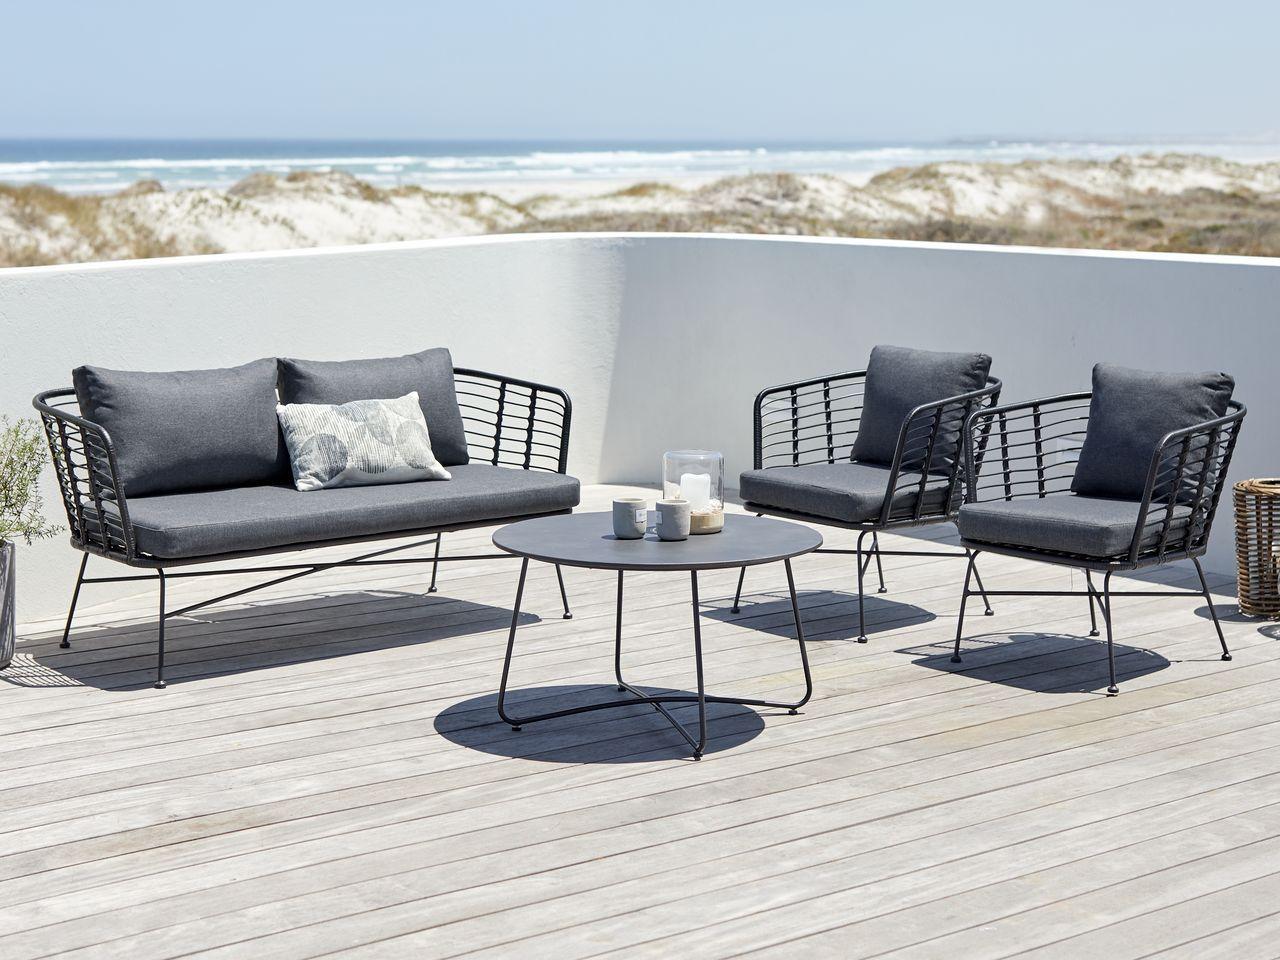 Sohvaryhma Antarktika 4 5 Istut Musta Jysk Outdoor Furniture Sets Lounge Furniture Luxury Cushions